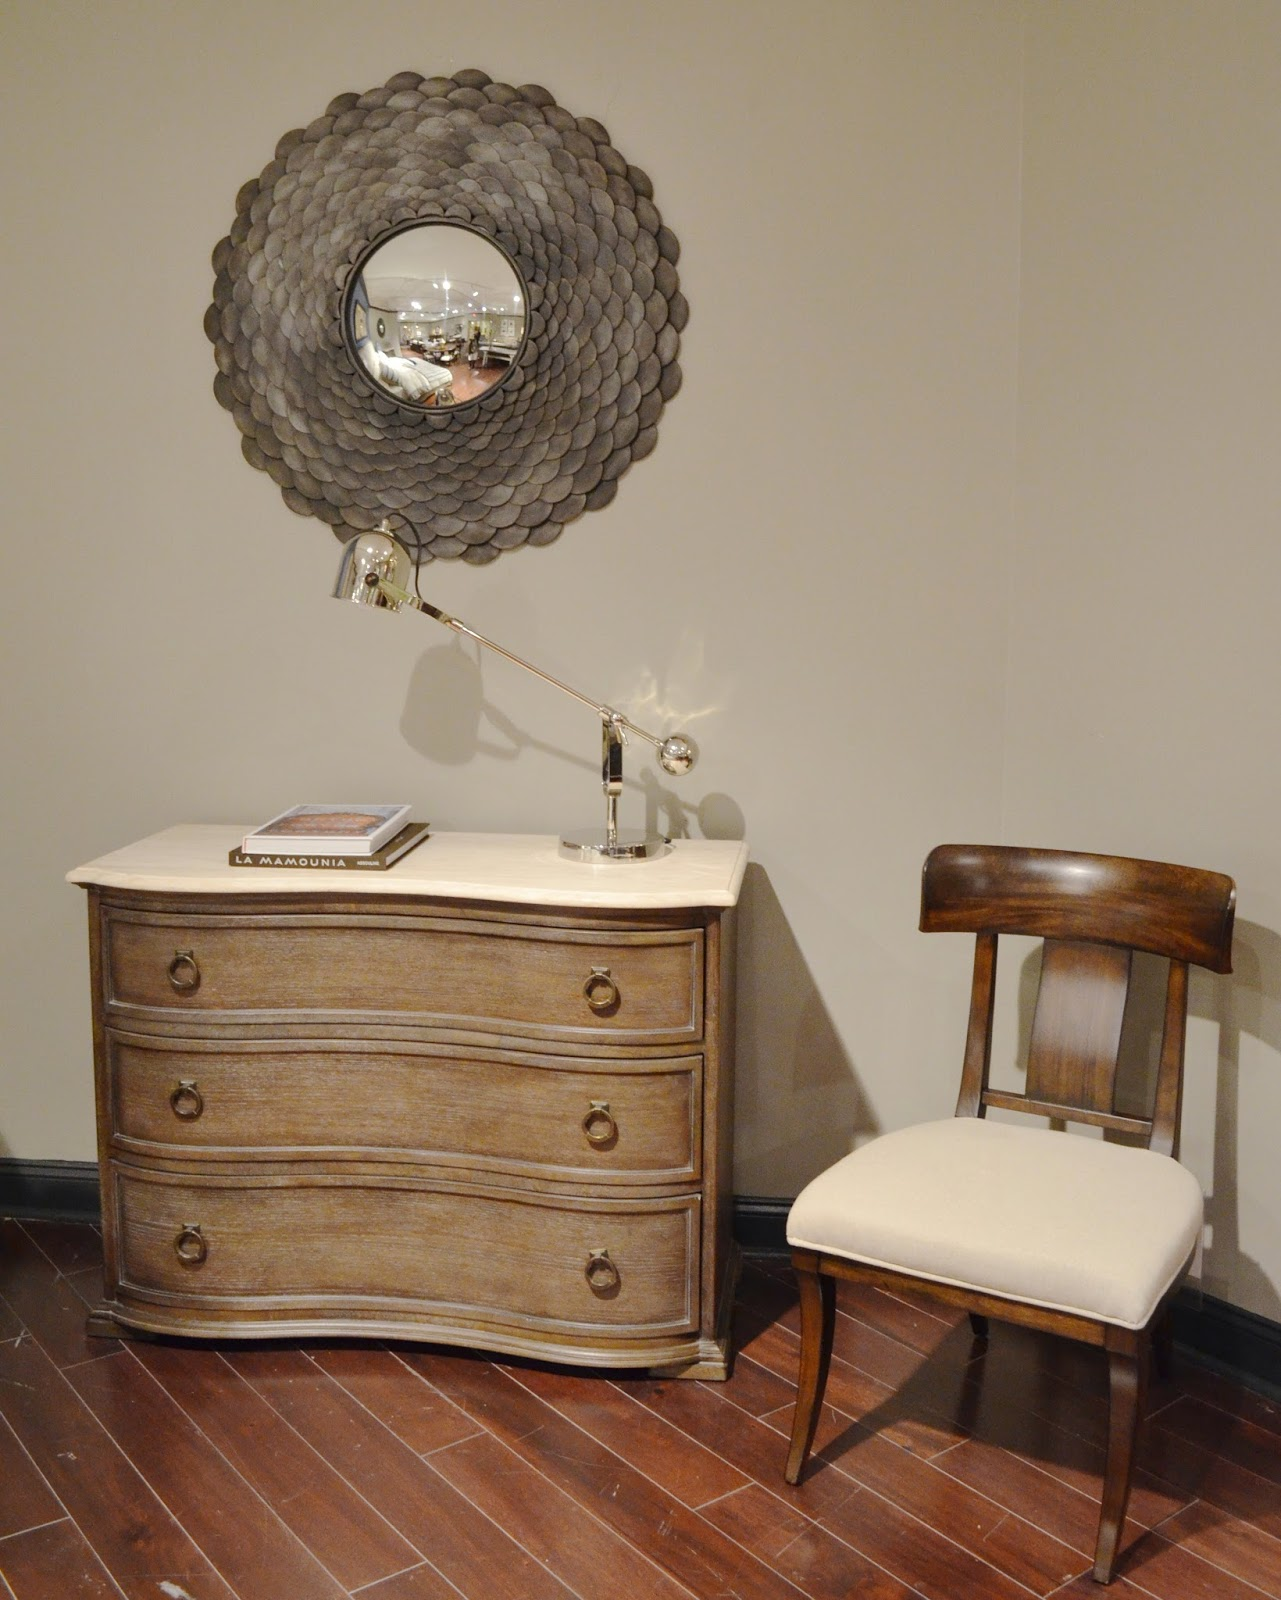 Ordinaire Thomasville Furniture At High Point Market